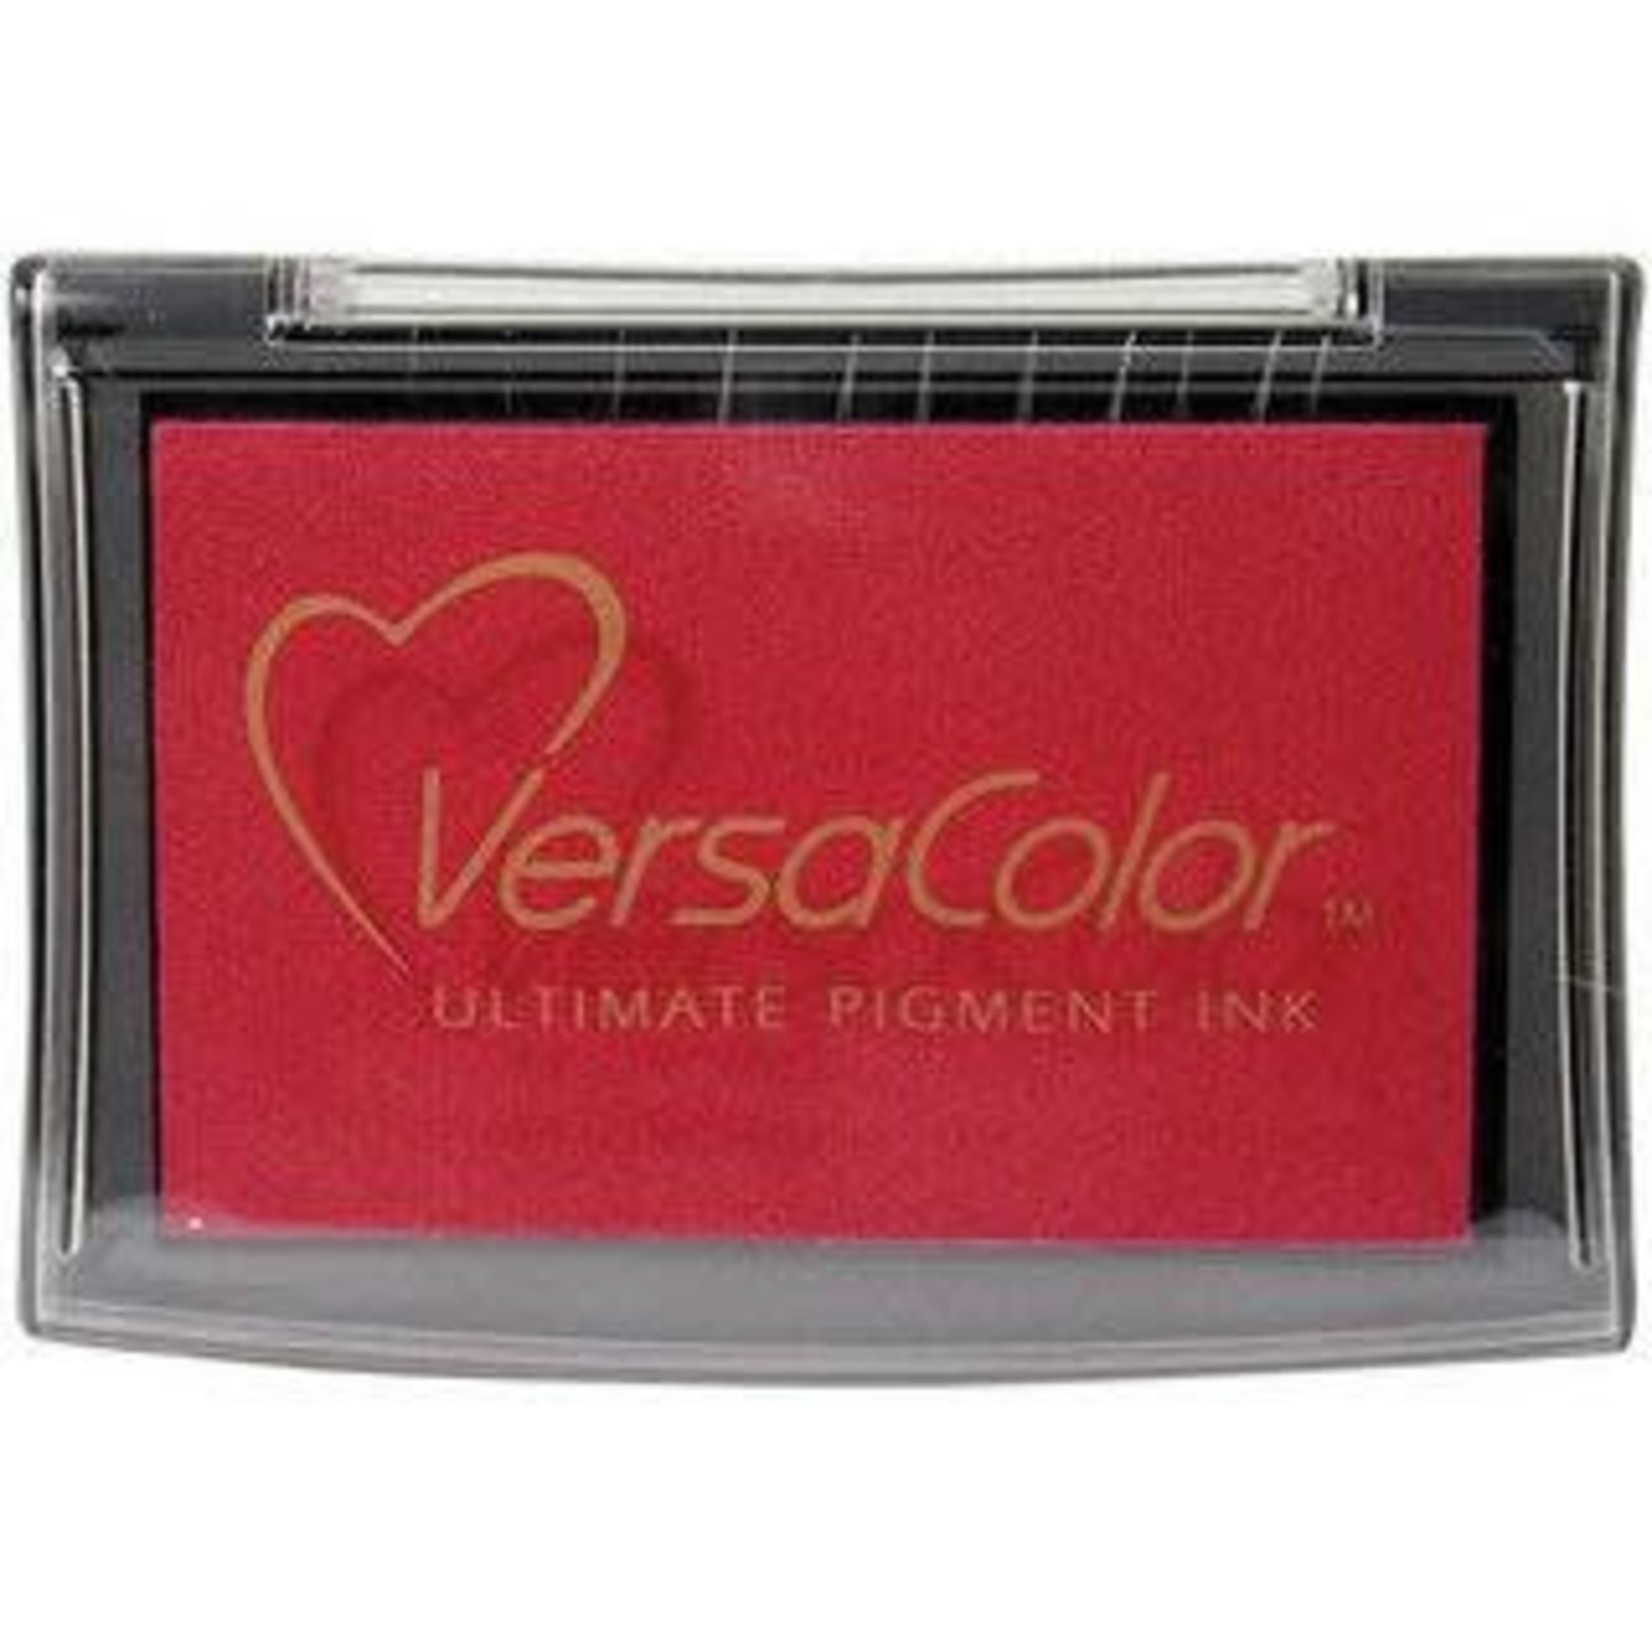 VersaColor VersaColor Pigimate Ink Cardinal